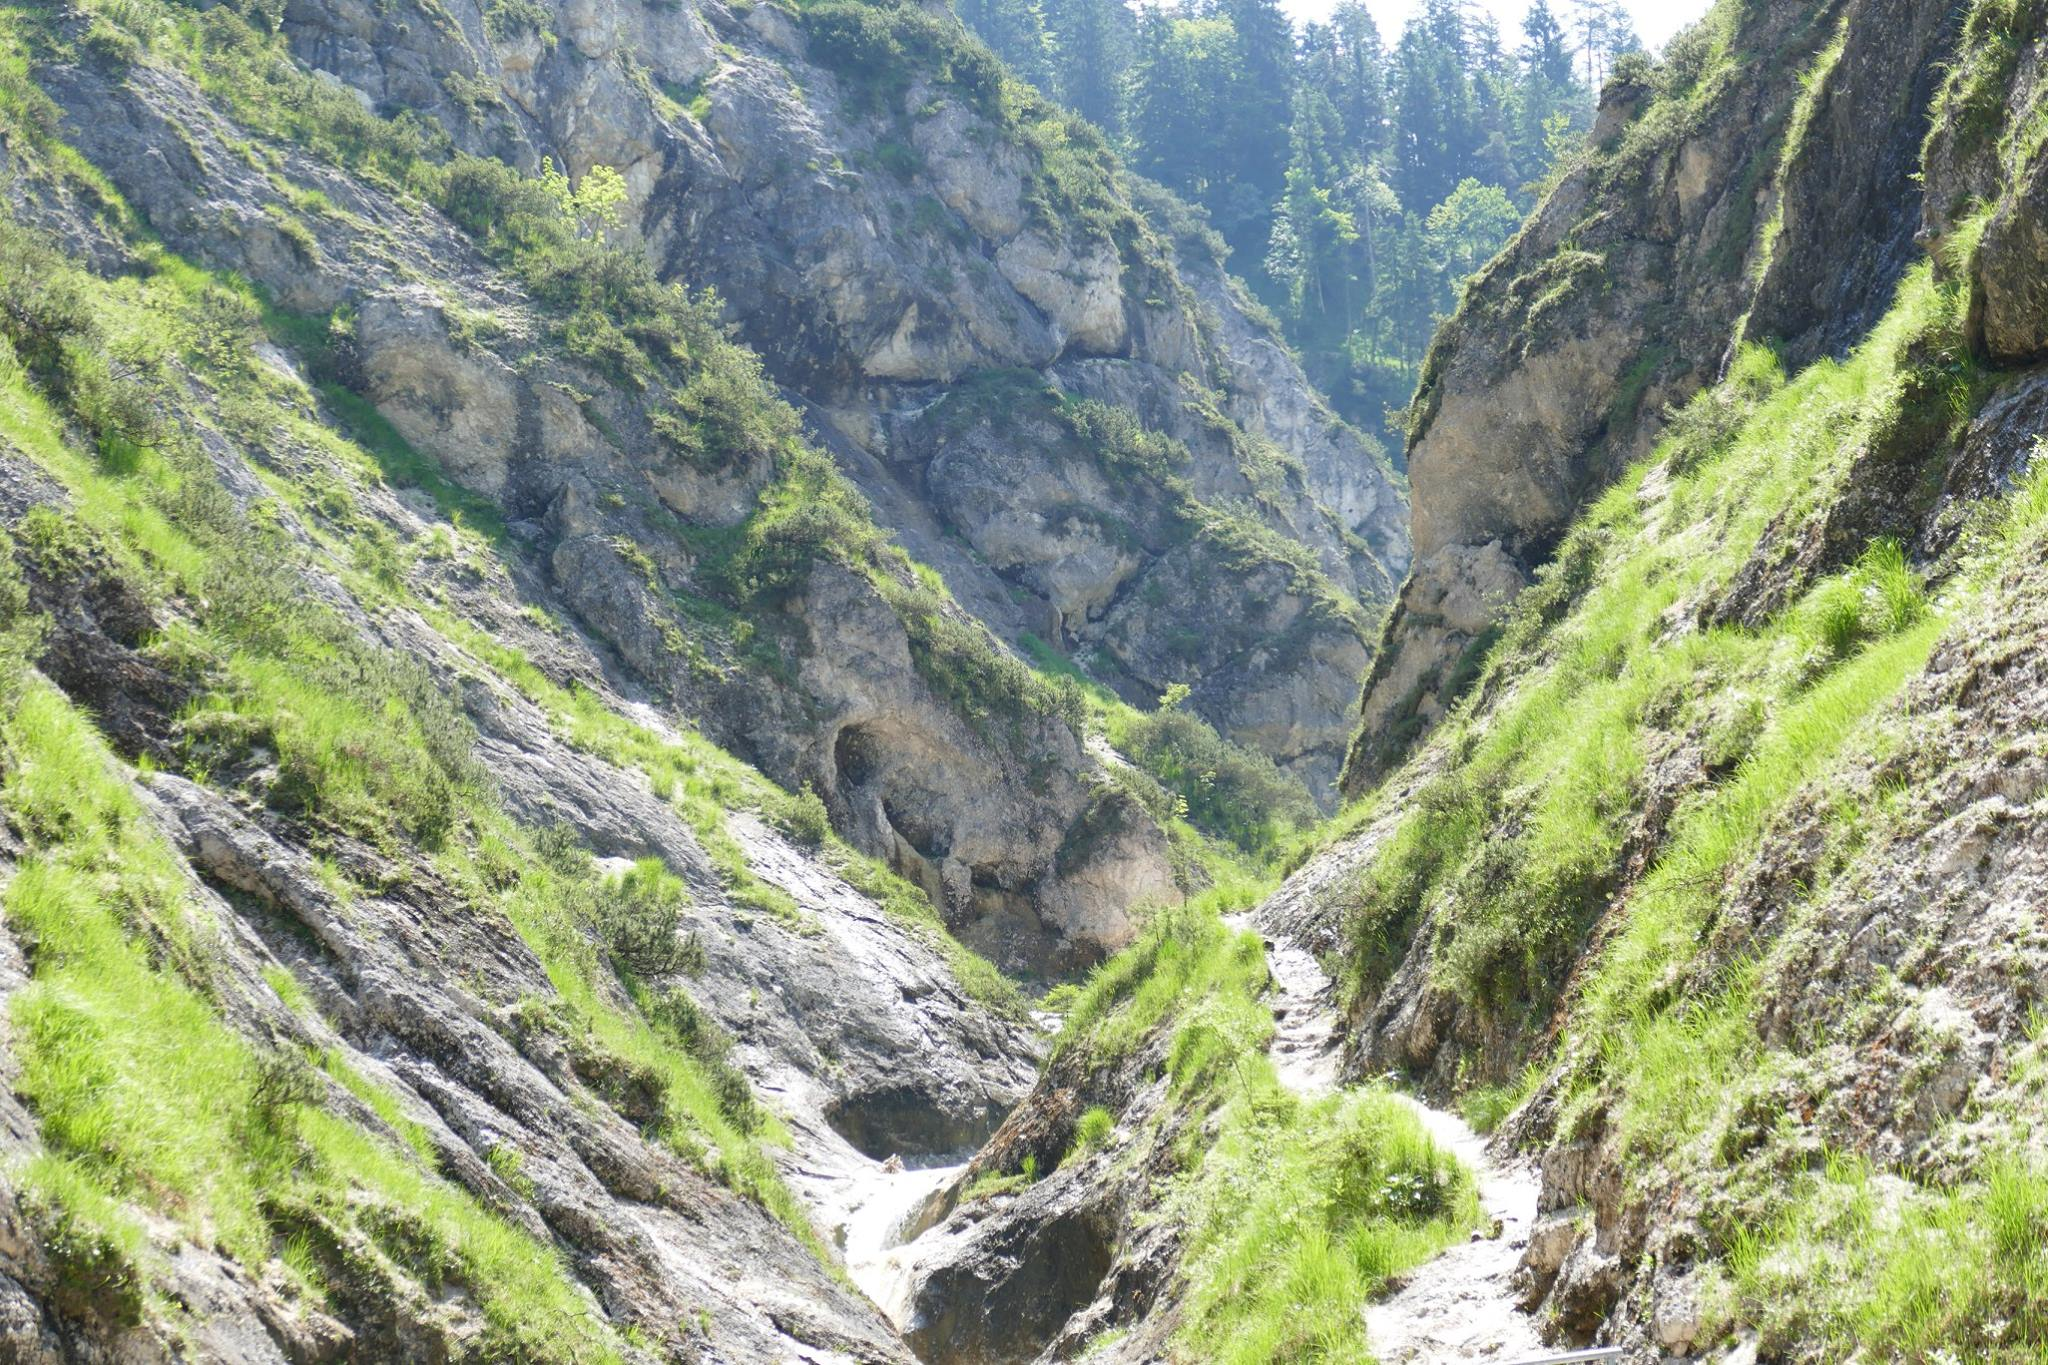 Goldprospektion Alpen Juni 2016 (4) - Torsten Marx